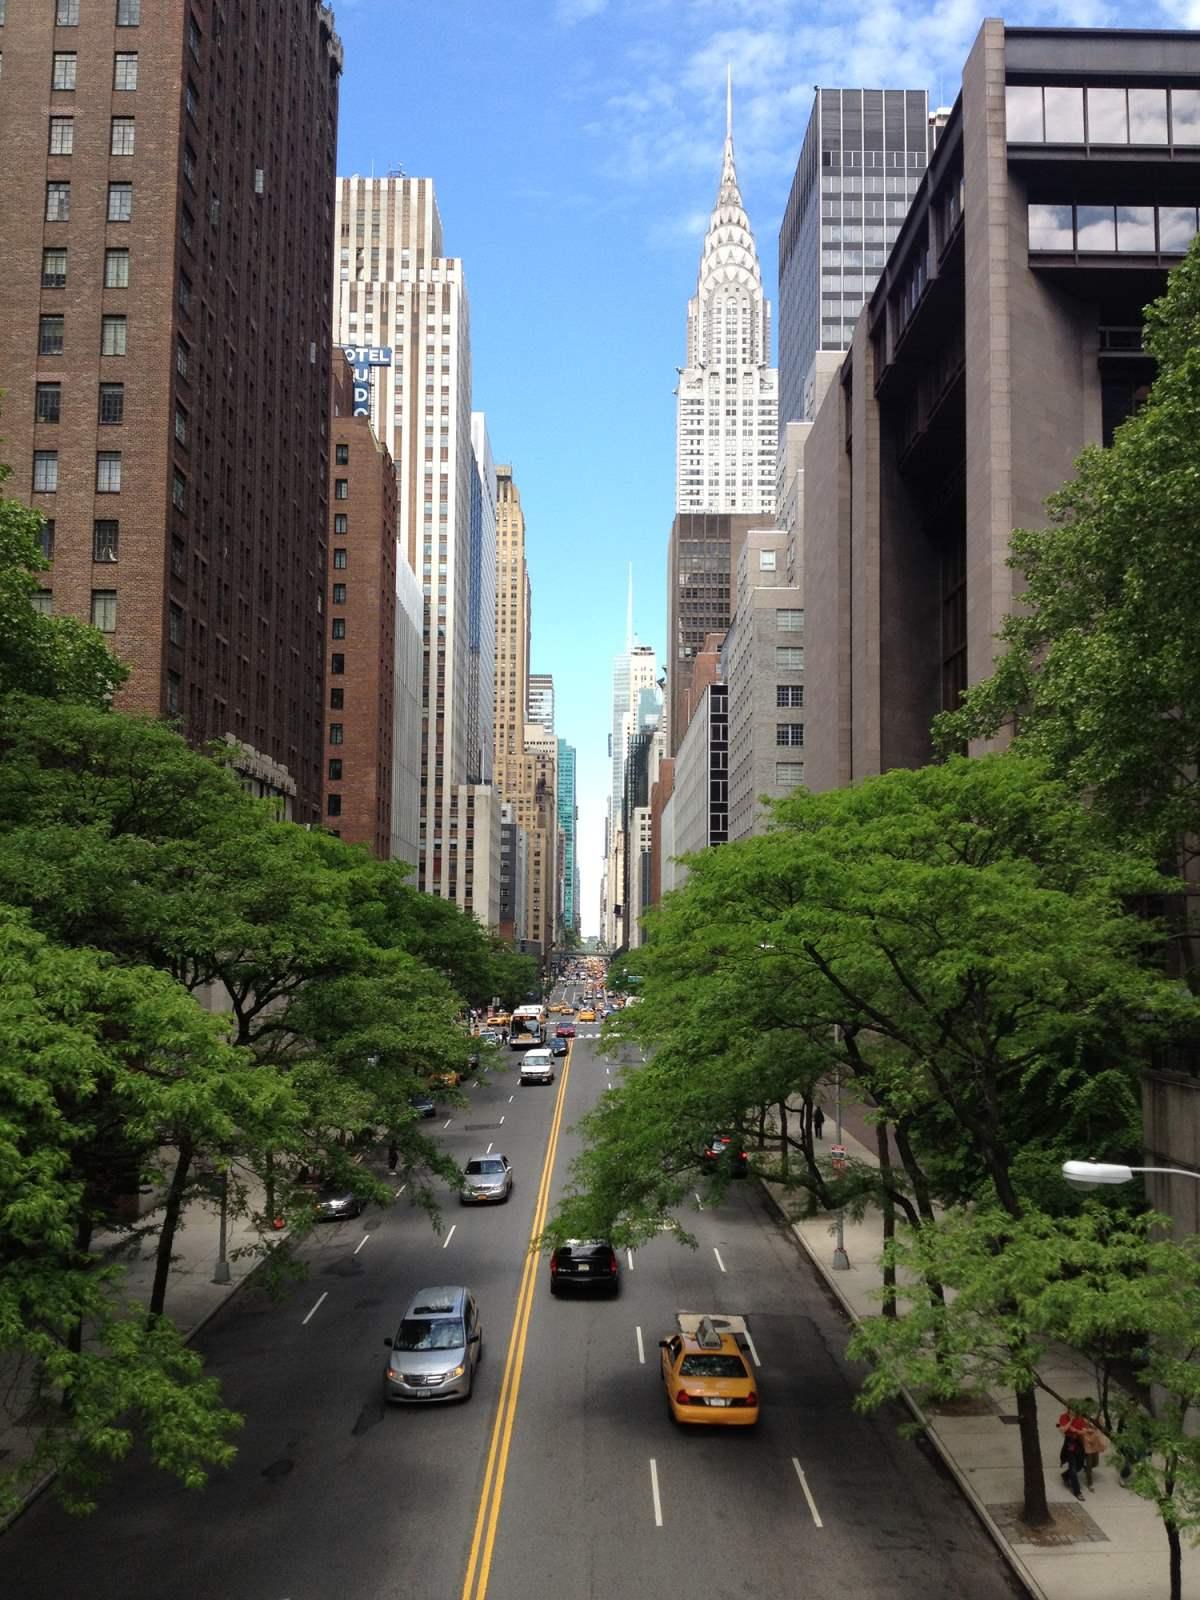 15 Utrolige Udsigtspunkter i New York City - Tudor City Bridge - Rejs Dig Lykkelig